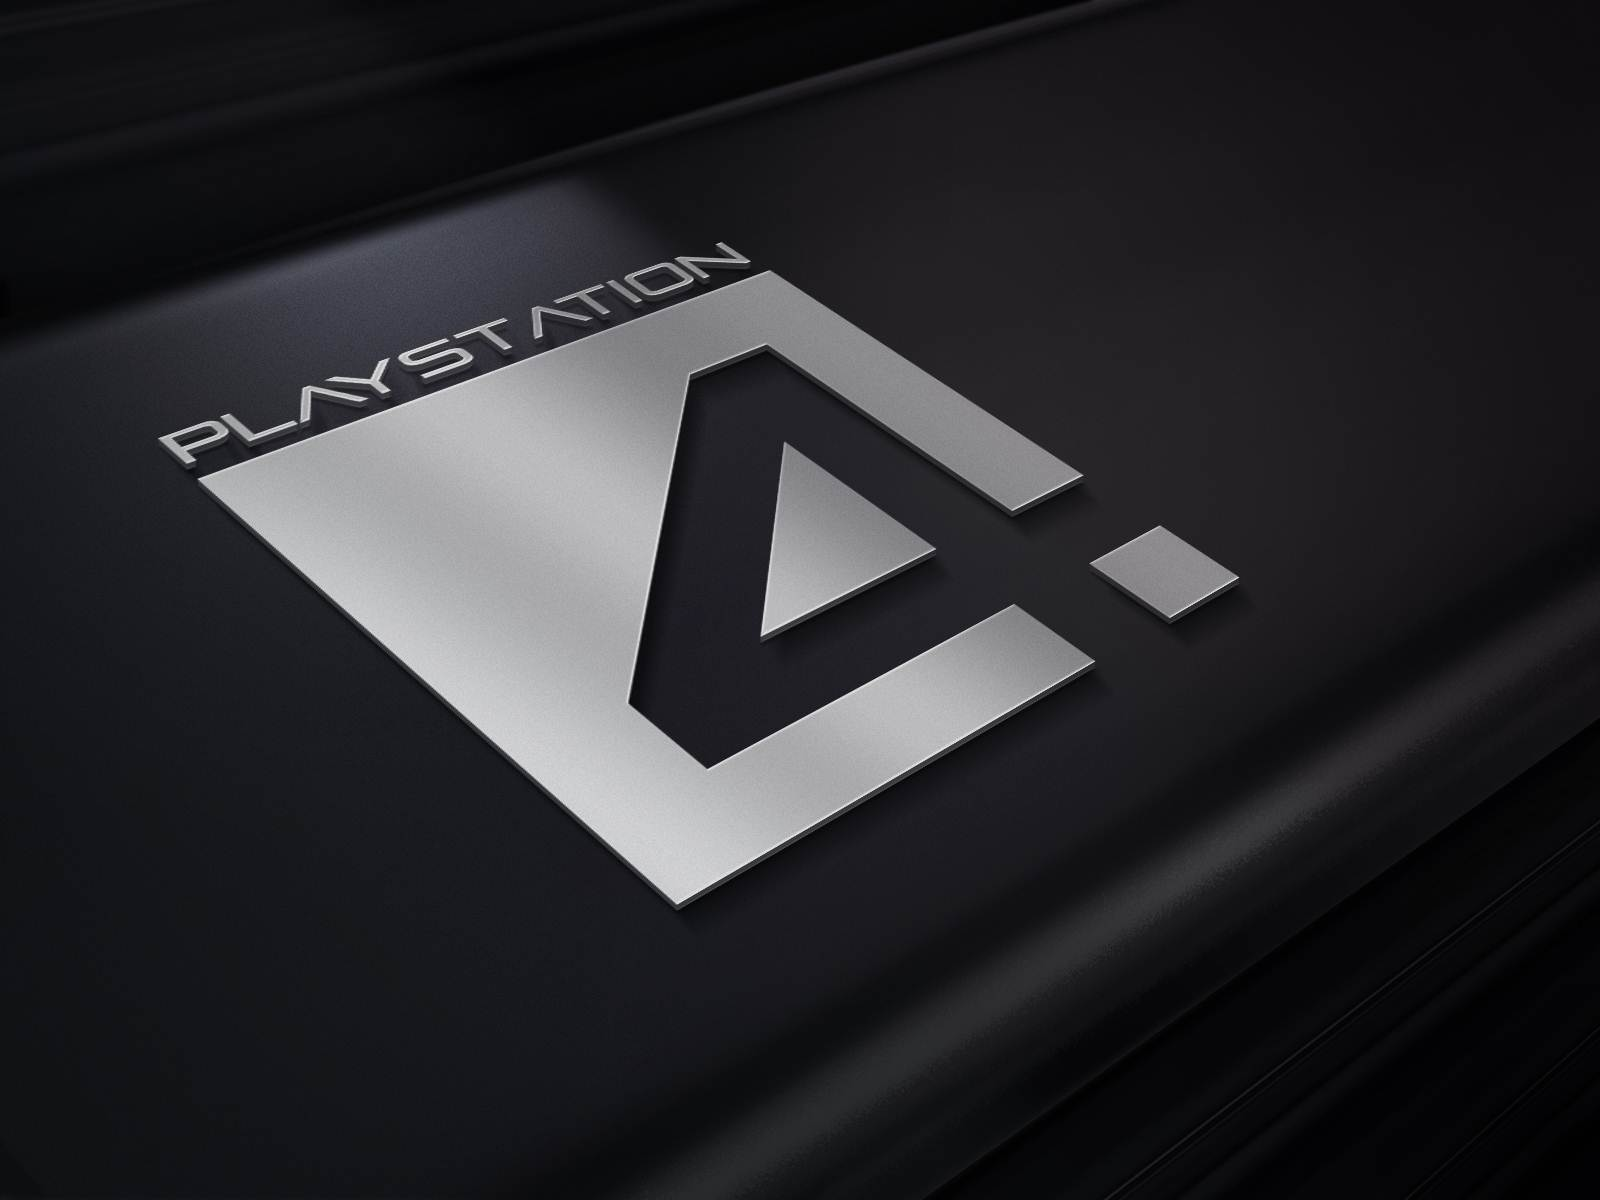 ps4 logo 3